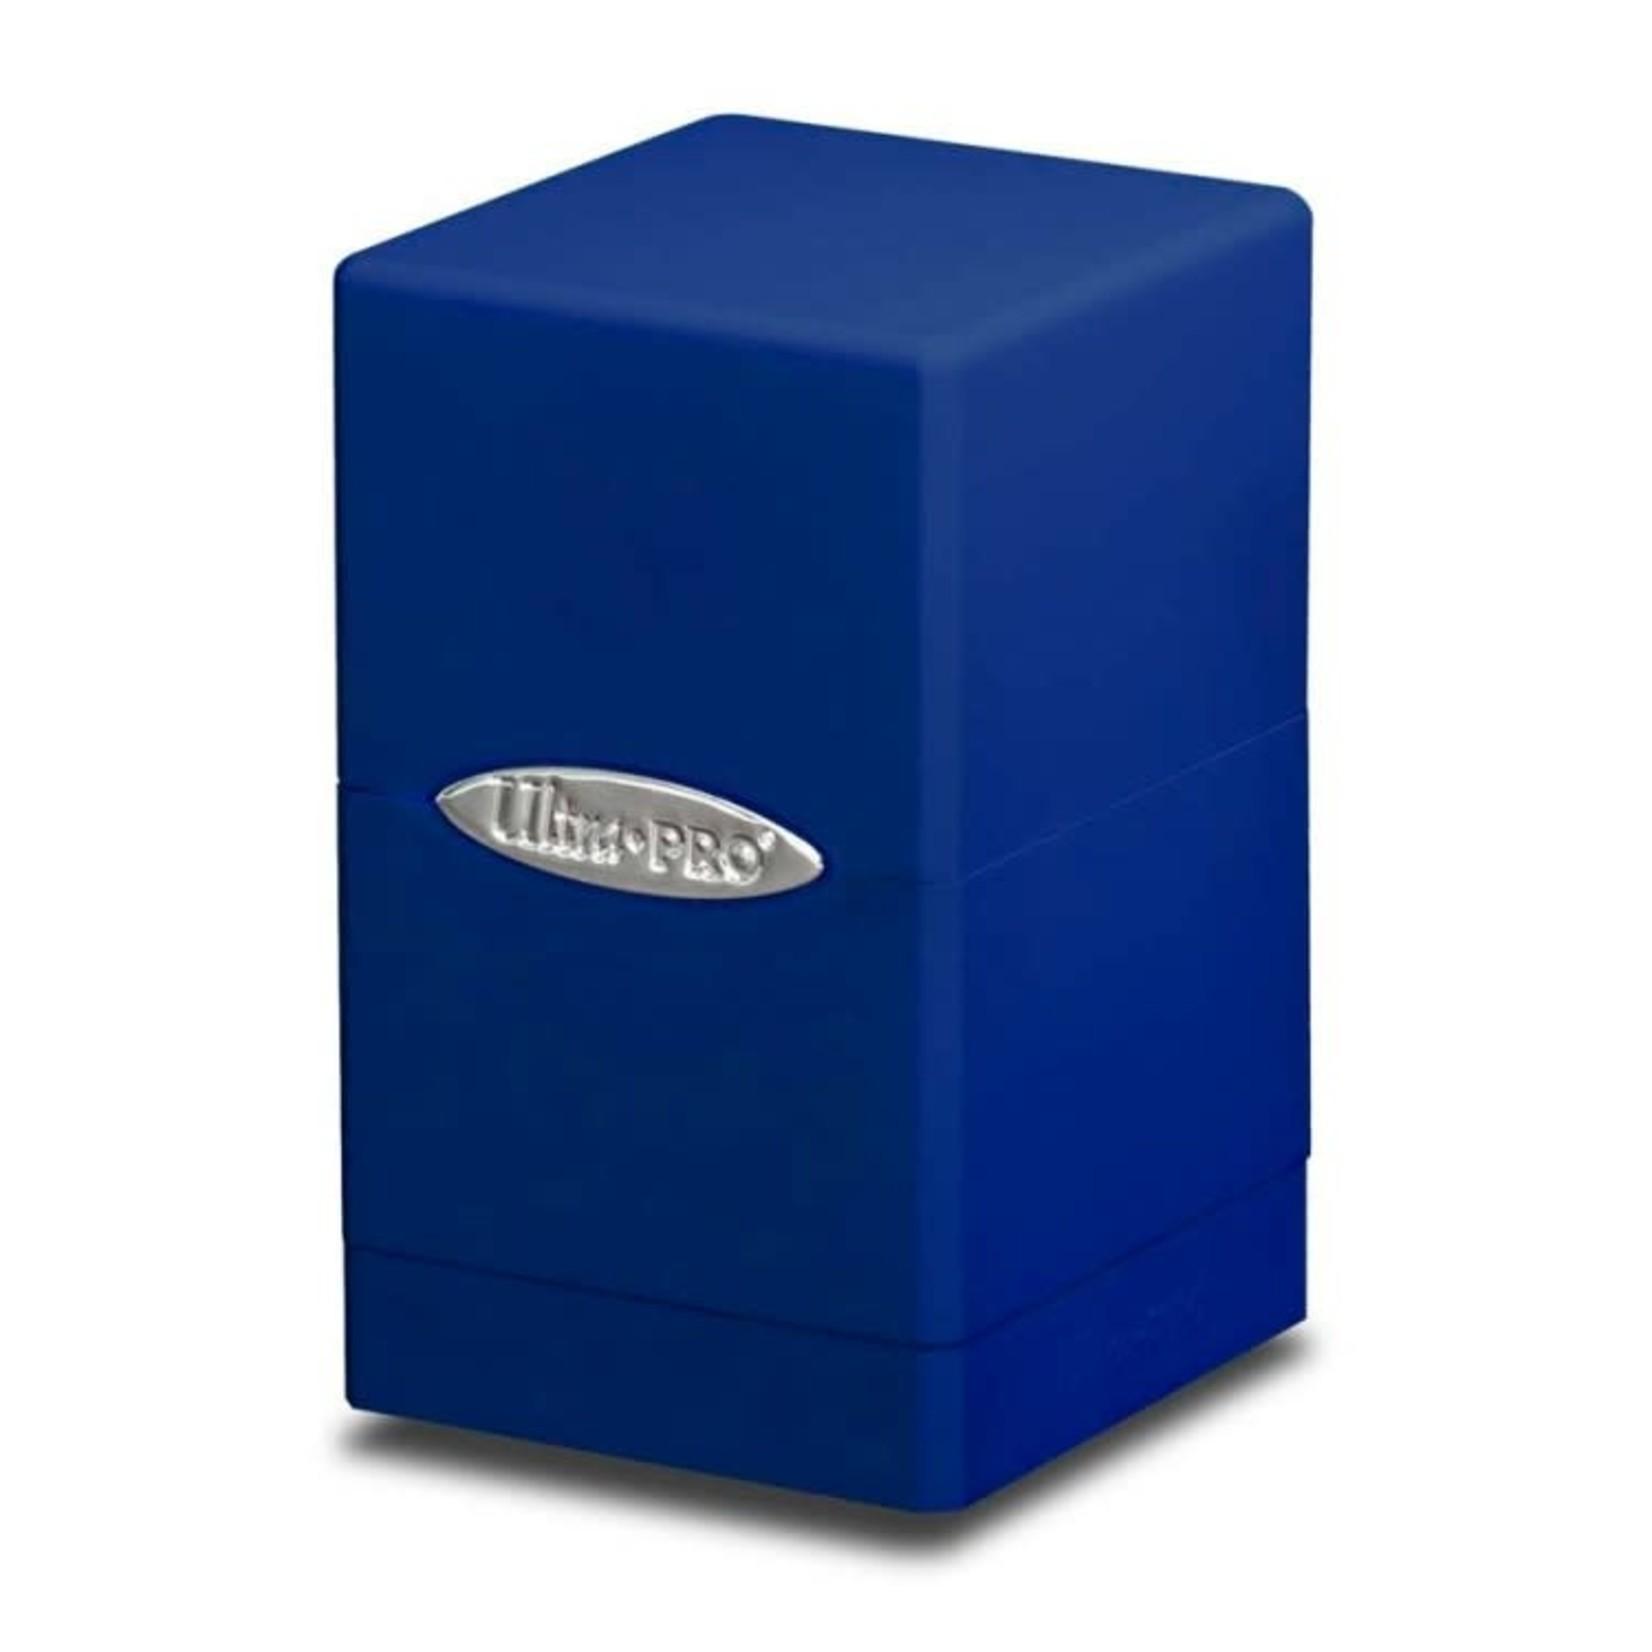 Ultra Pro Ultra-Pro Satin Tower Blue